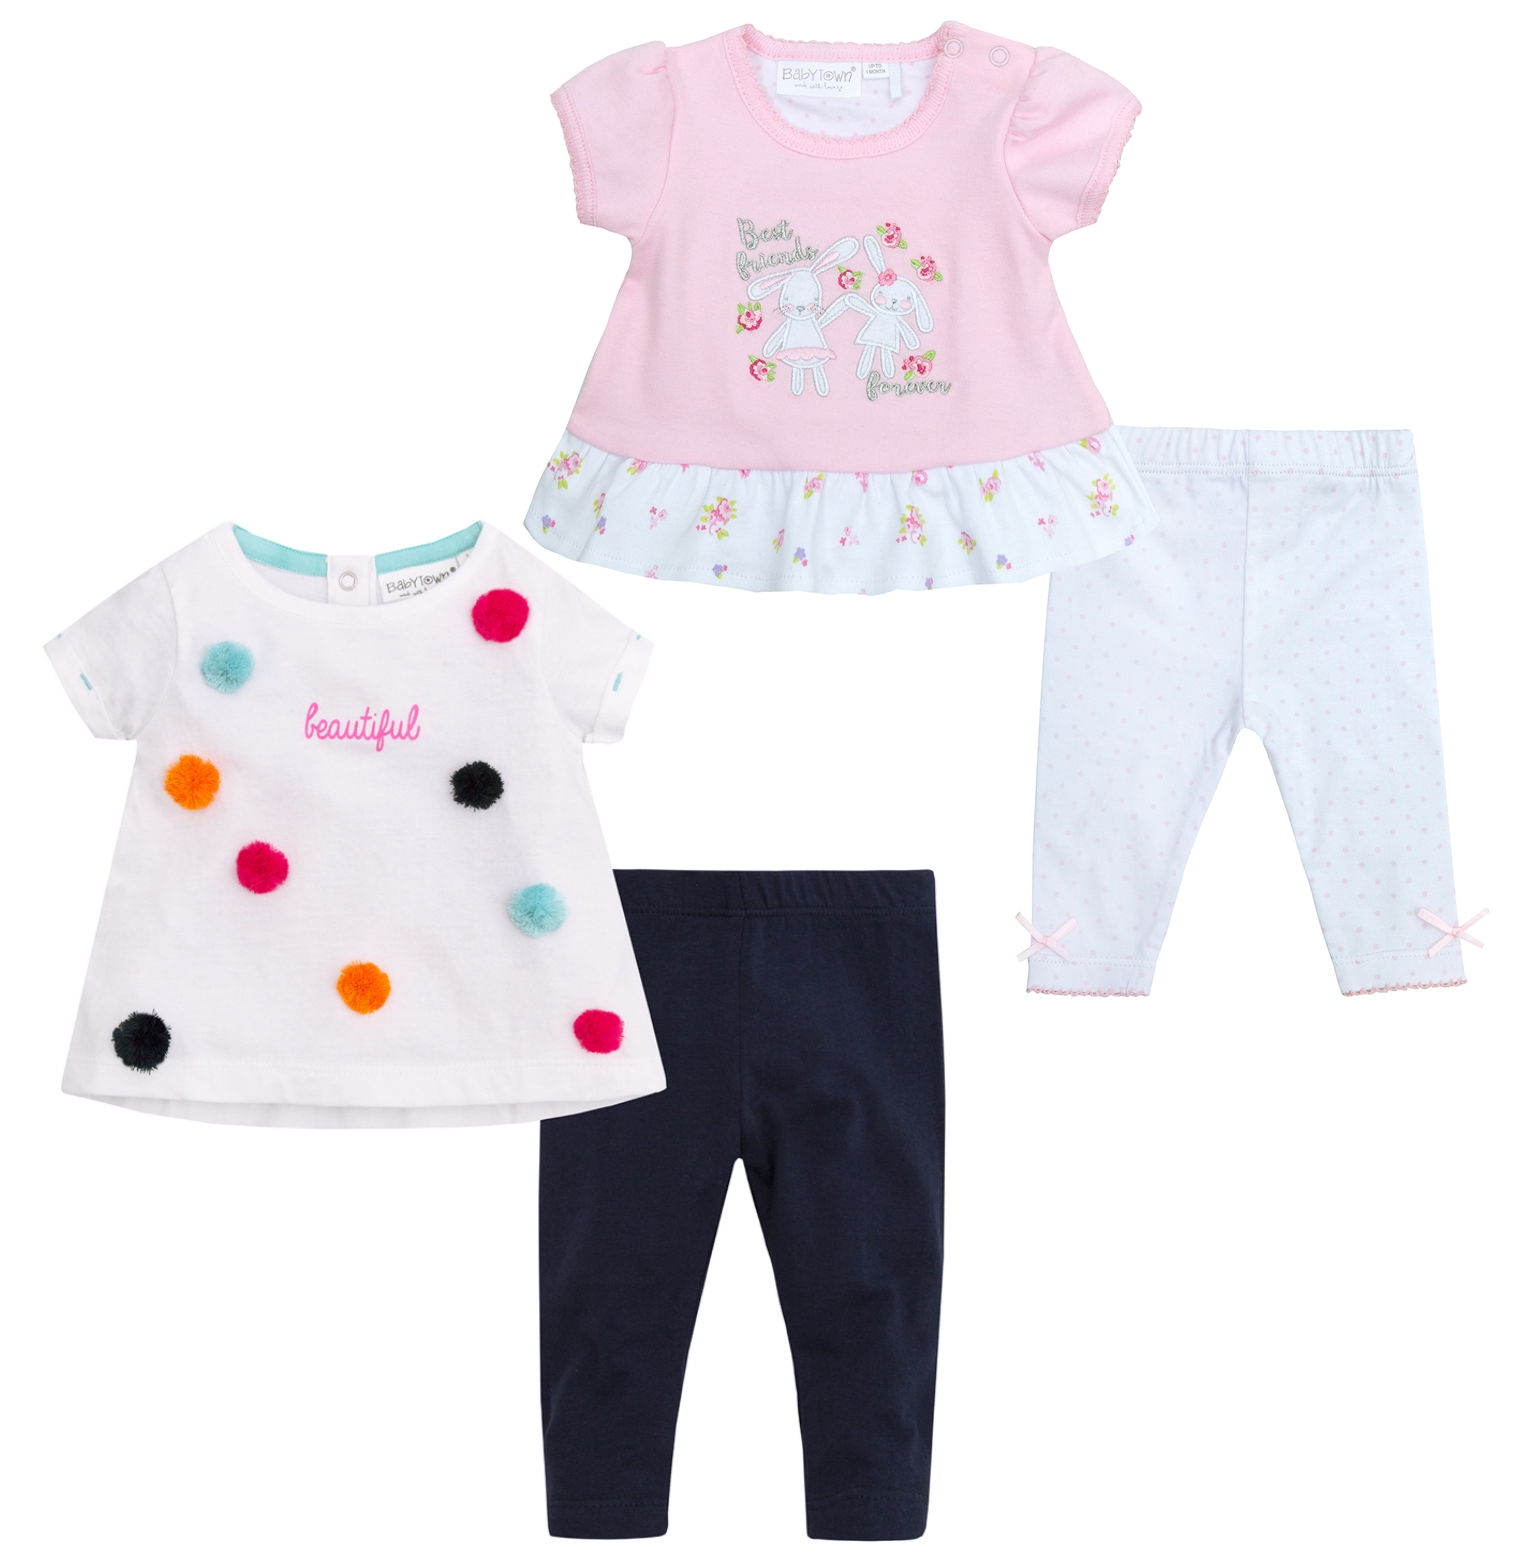 Babytown Newborn Baby Girls Pom Pom T-Shirt /& Leggings